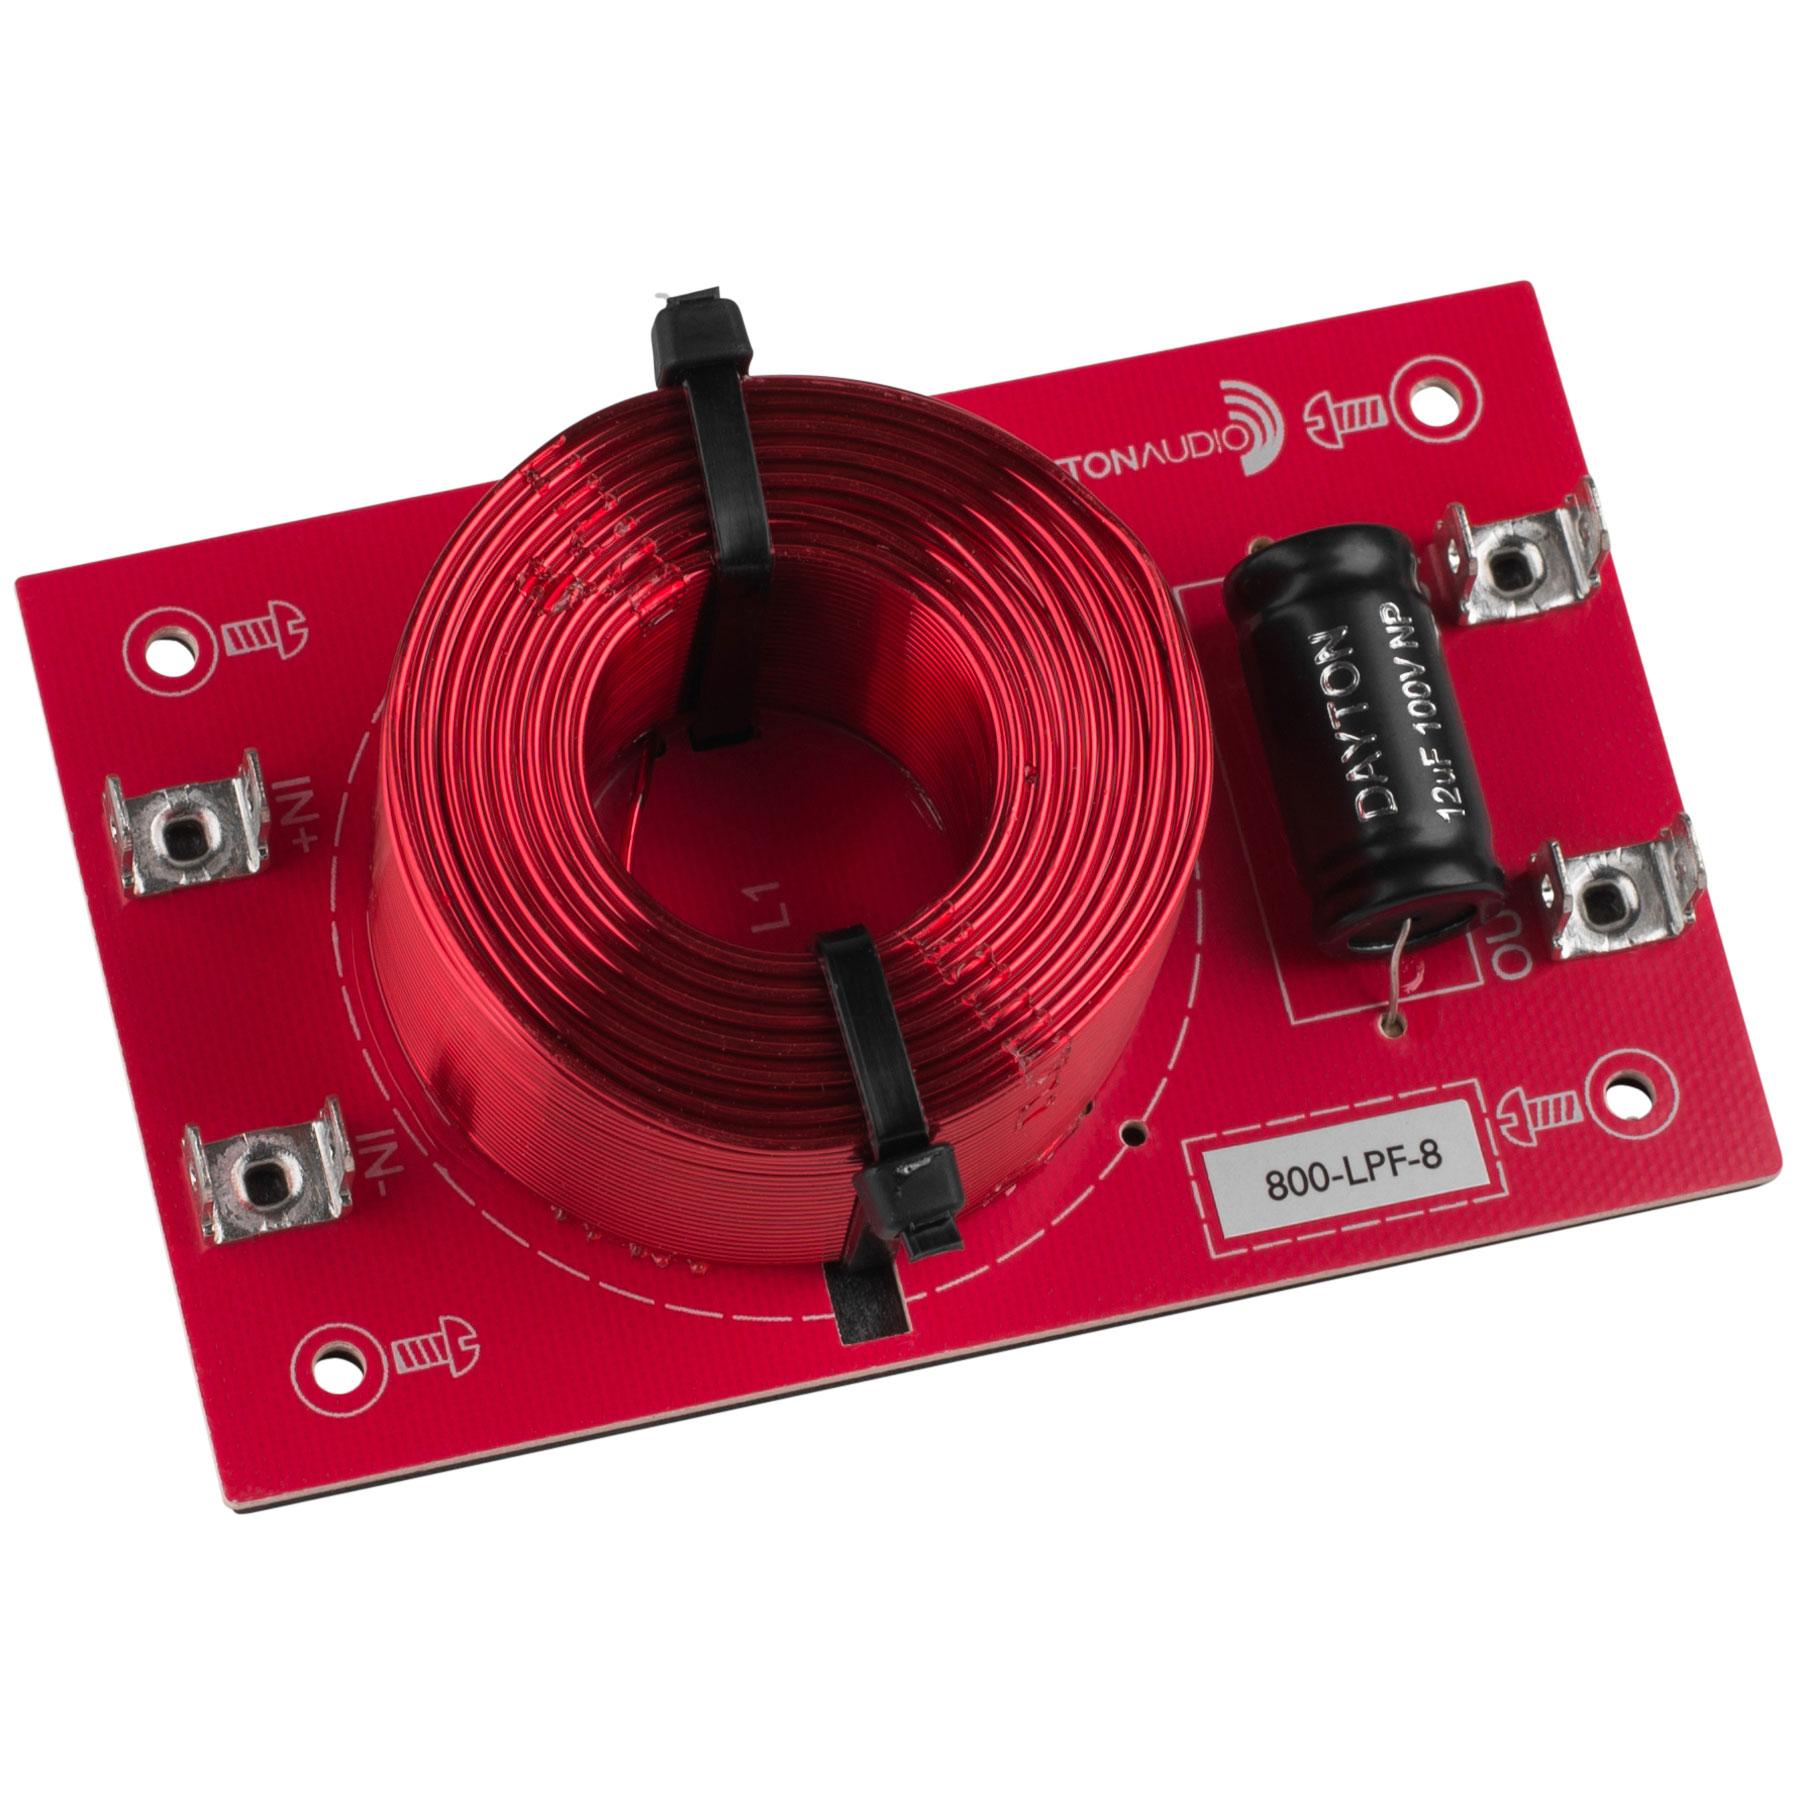 [DLF08]Dayton Audio 800-LPF-8(800 Hz:12 dB/Oct)画像